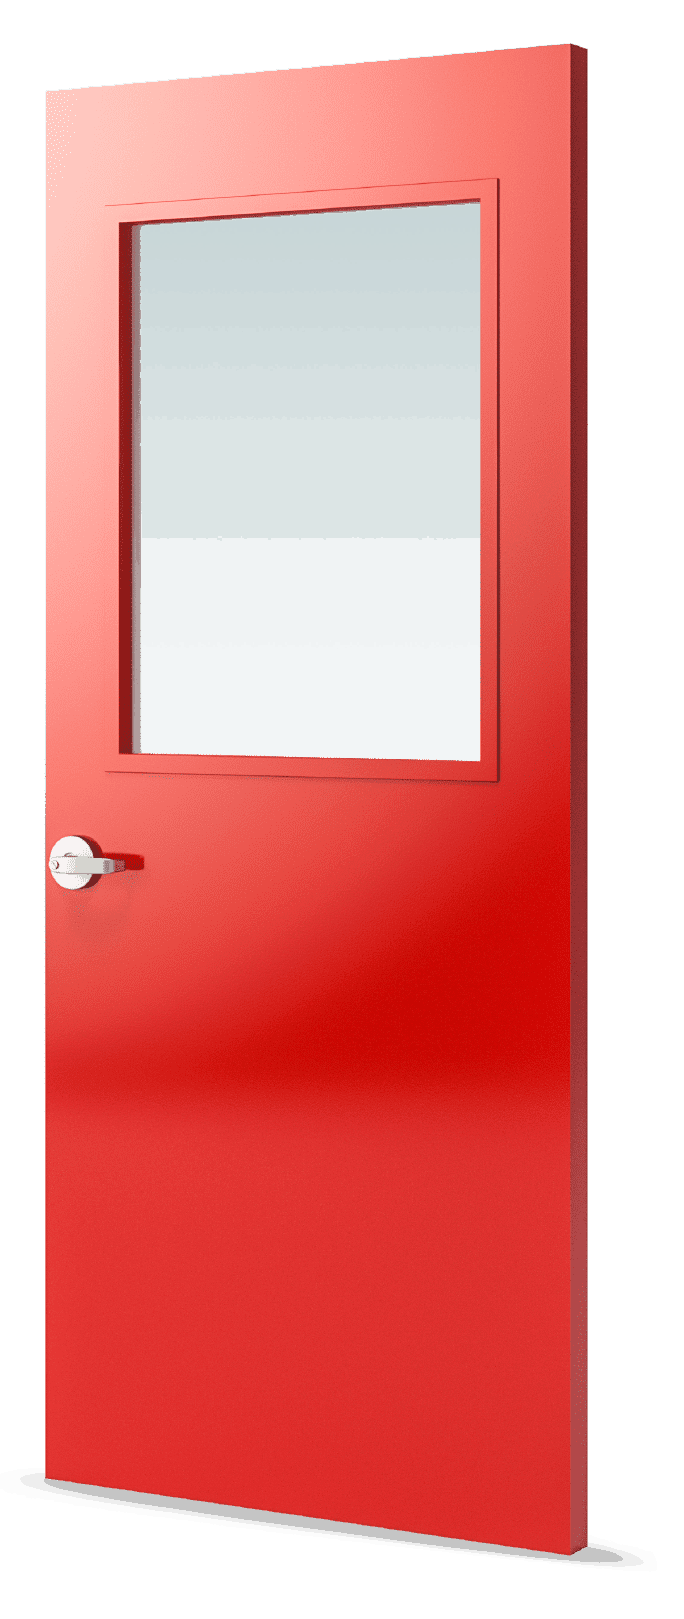 Af 100 Smooth Pultruded Fiberglass Door Special Lite